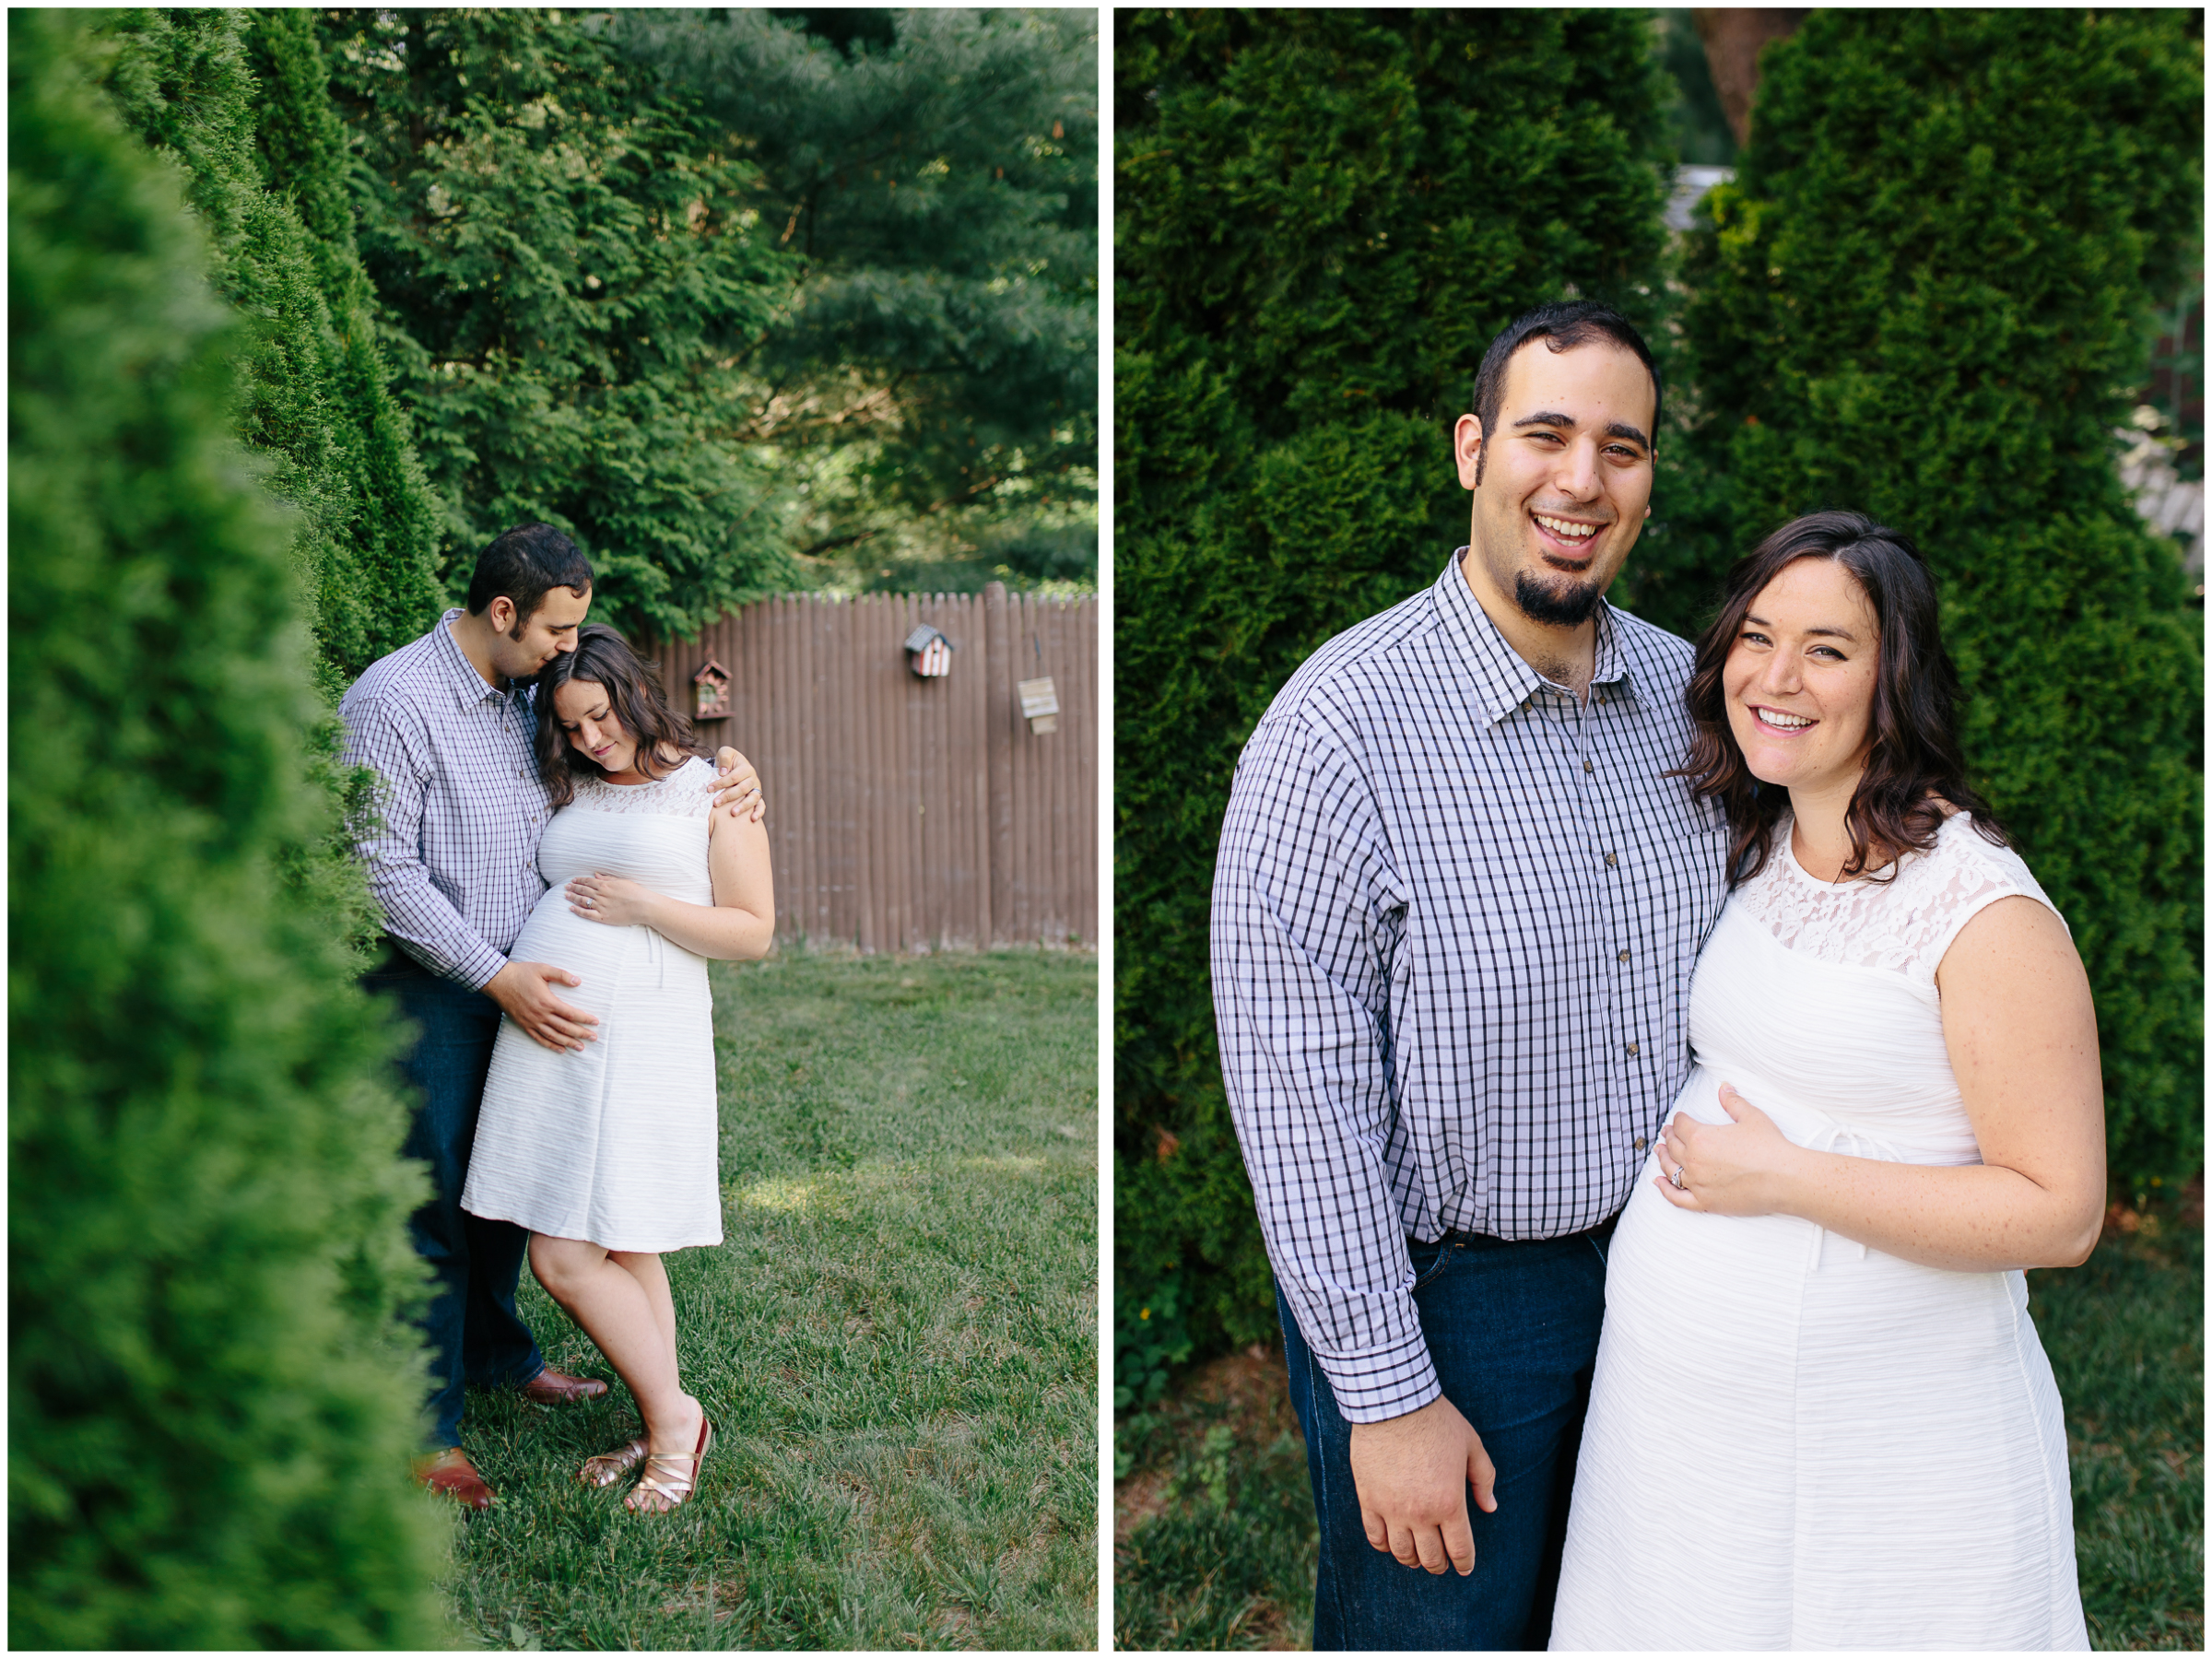 Adorable Lifestyle Maternity in Nashua, New Hampshire